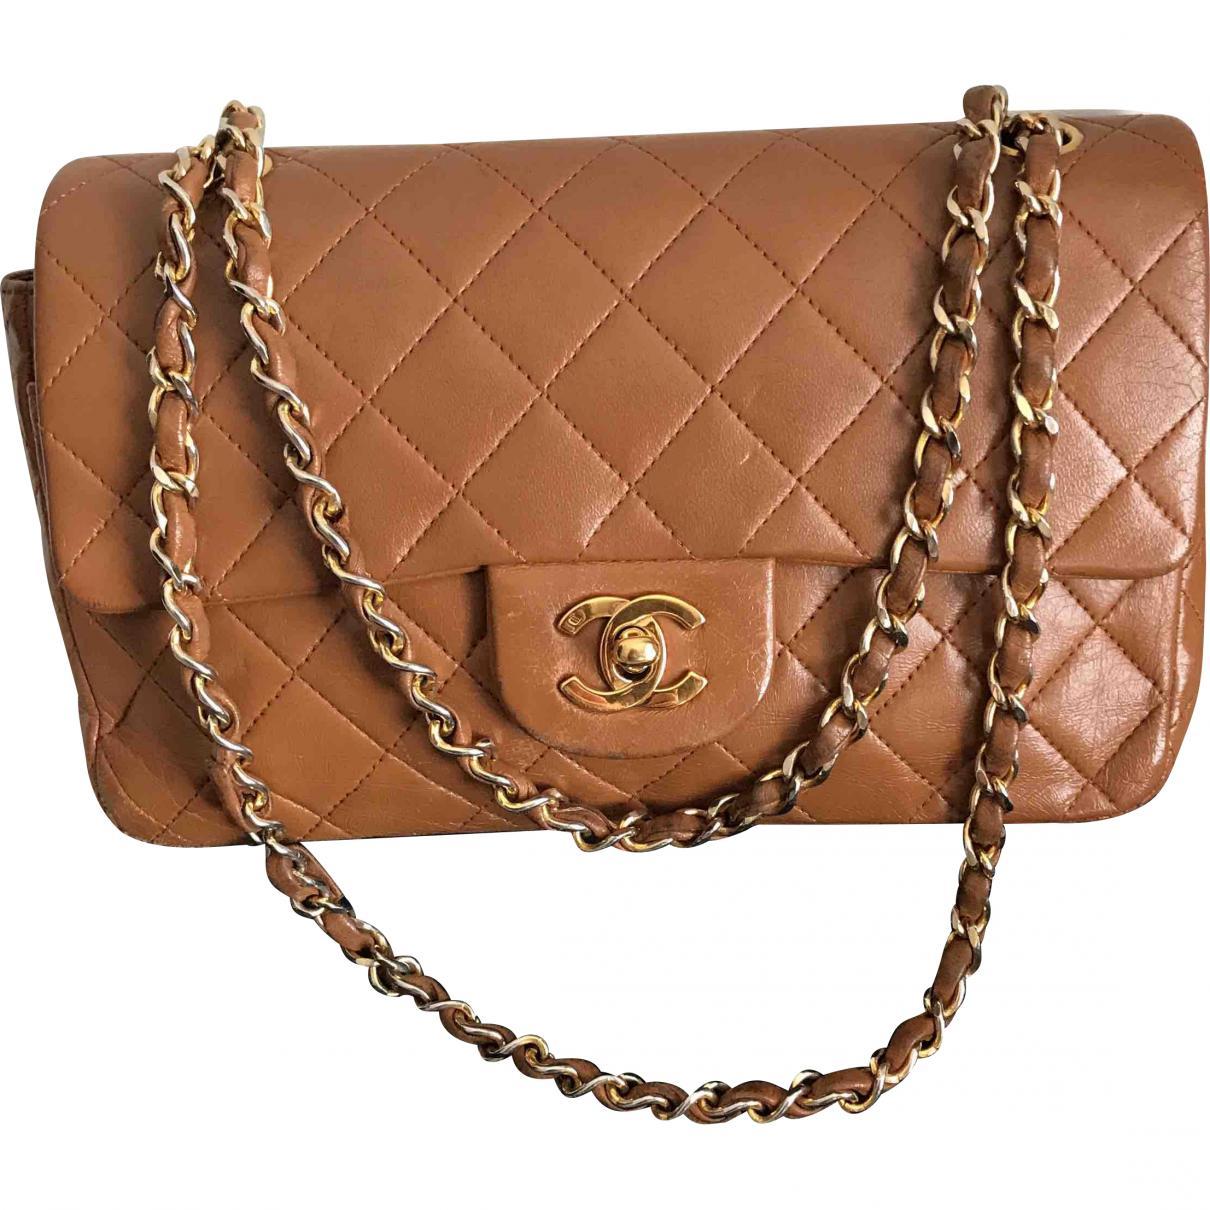 Chanel Women S Natural Pre Owned Vintage Timeless Camel Leather Handbag